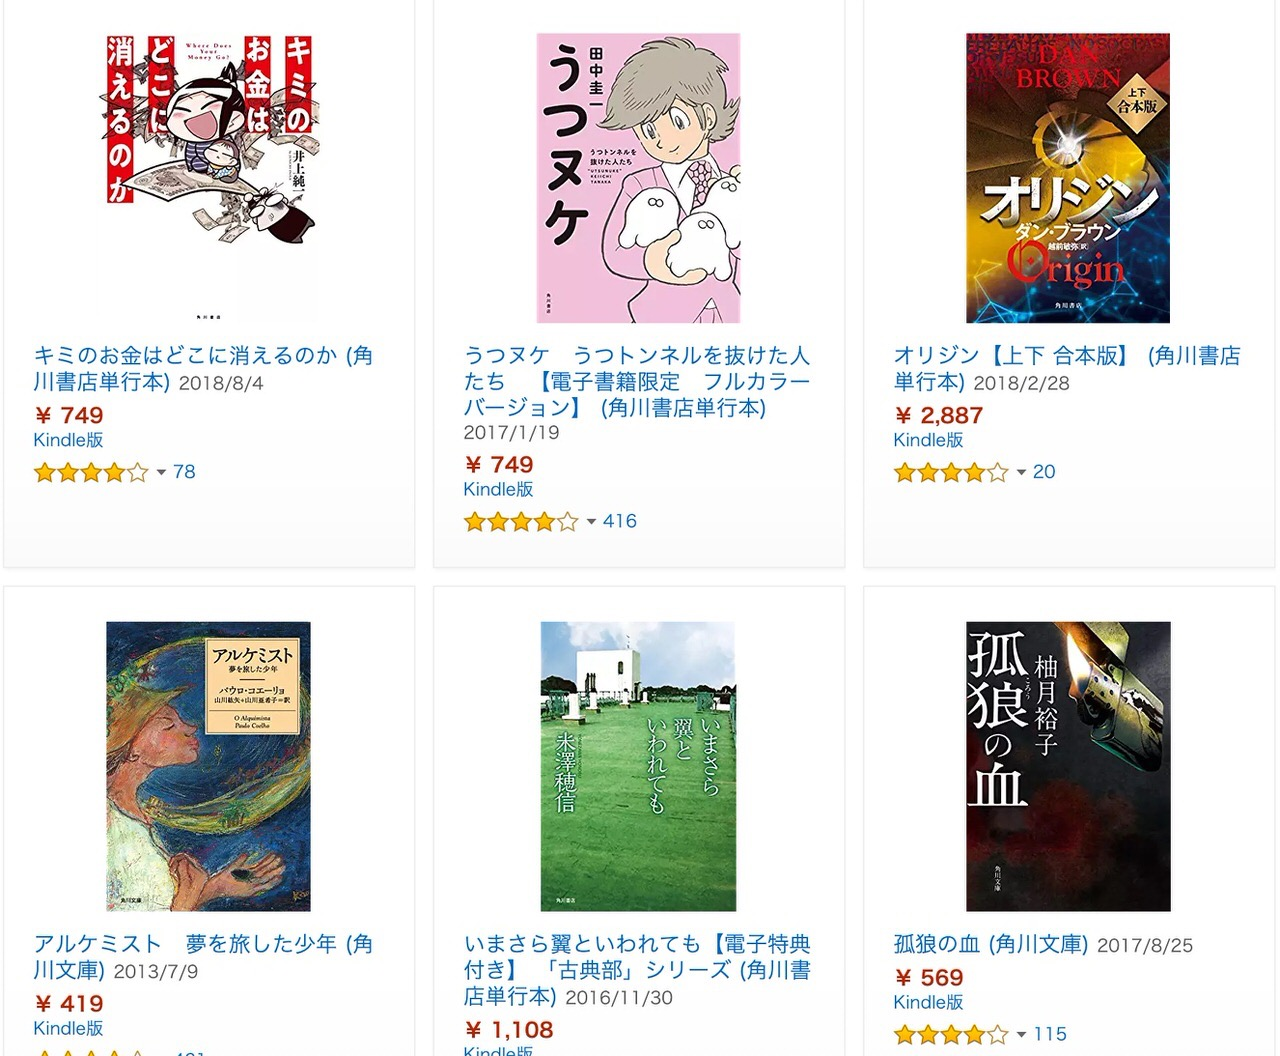 【Kindleセール】最大50%OFF「人気作品が盛りだくさん!THE・ベストフェア2018」(1/10まで)